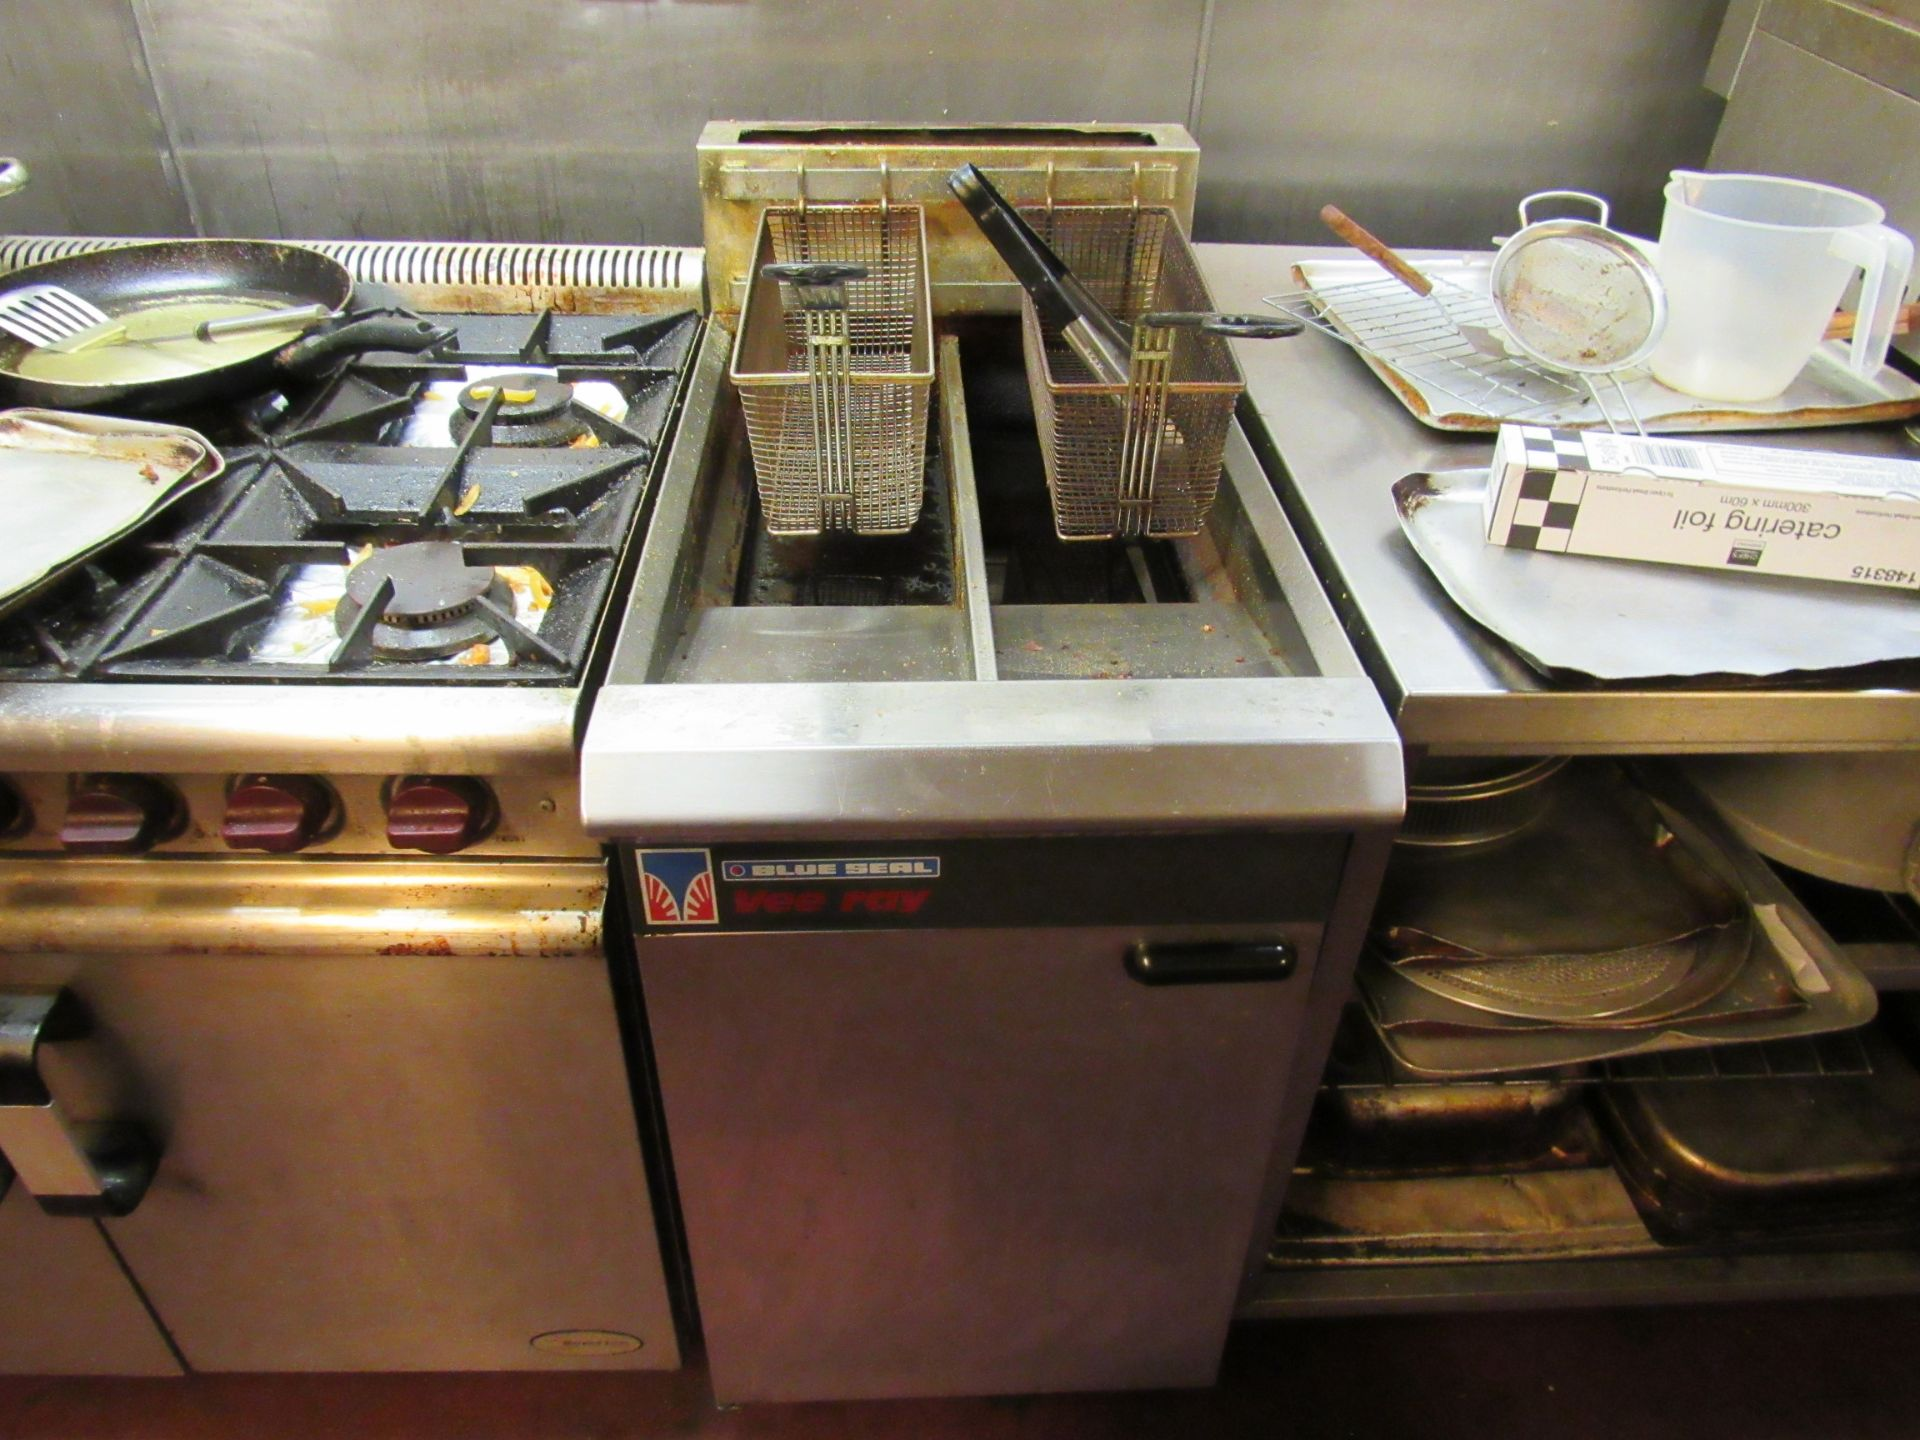 Blue Seal Vee Ray Twin Basket Deep Fat Fryer - Image 2 of 2